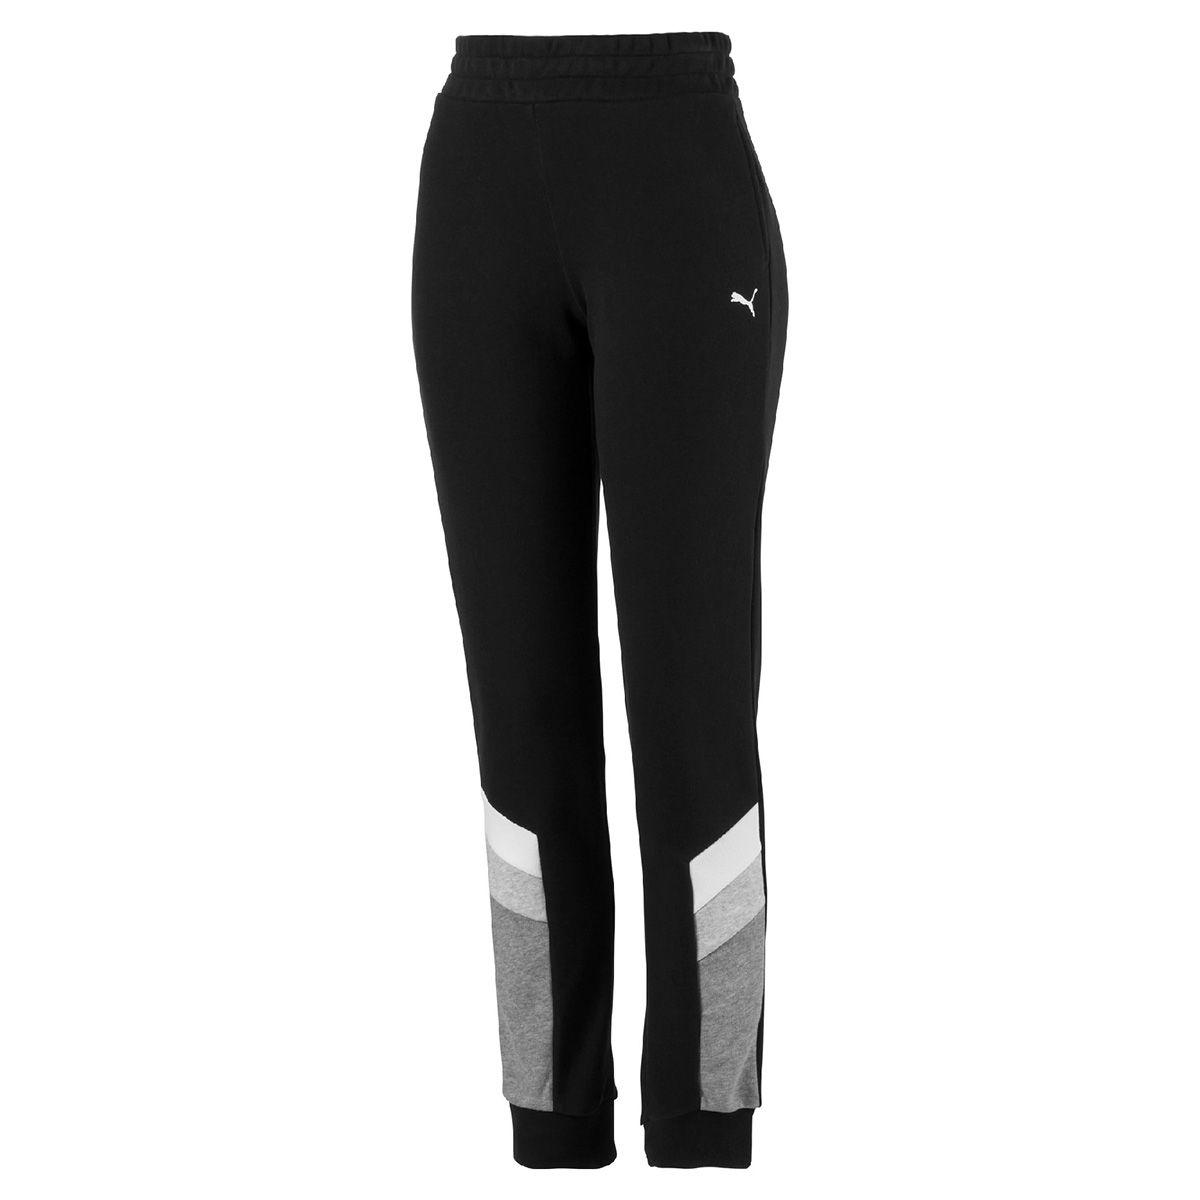 Calça Feminino Puma Athletics Sweat Pants